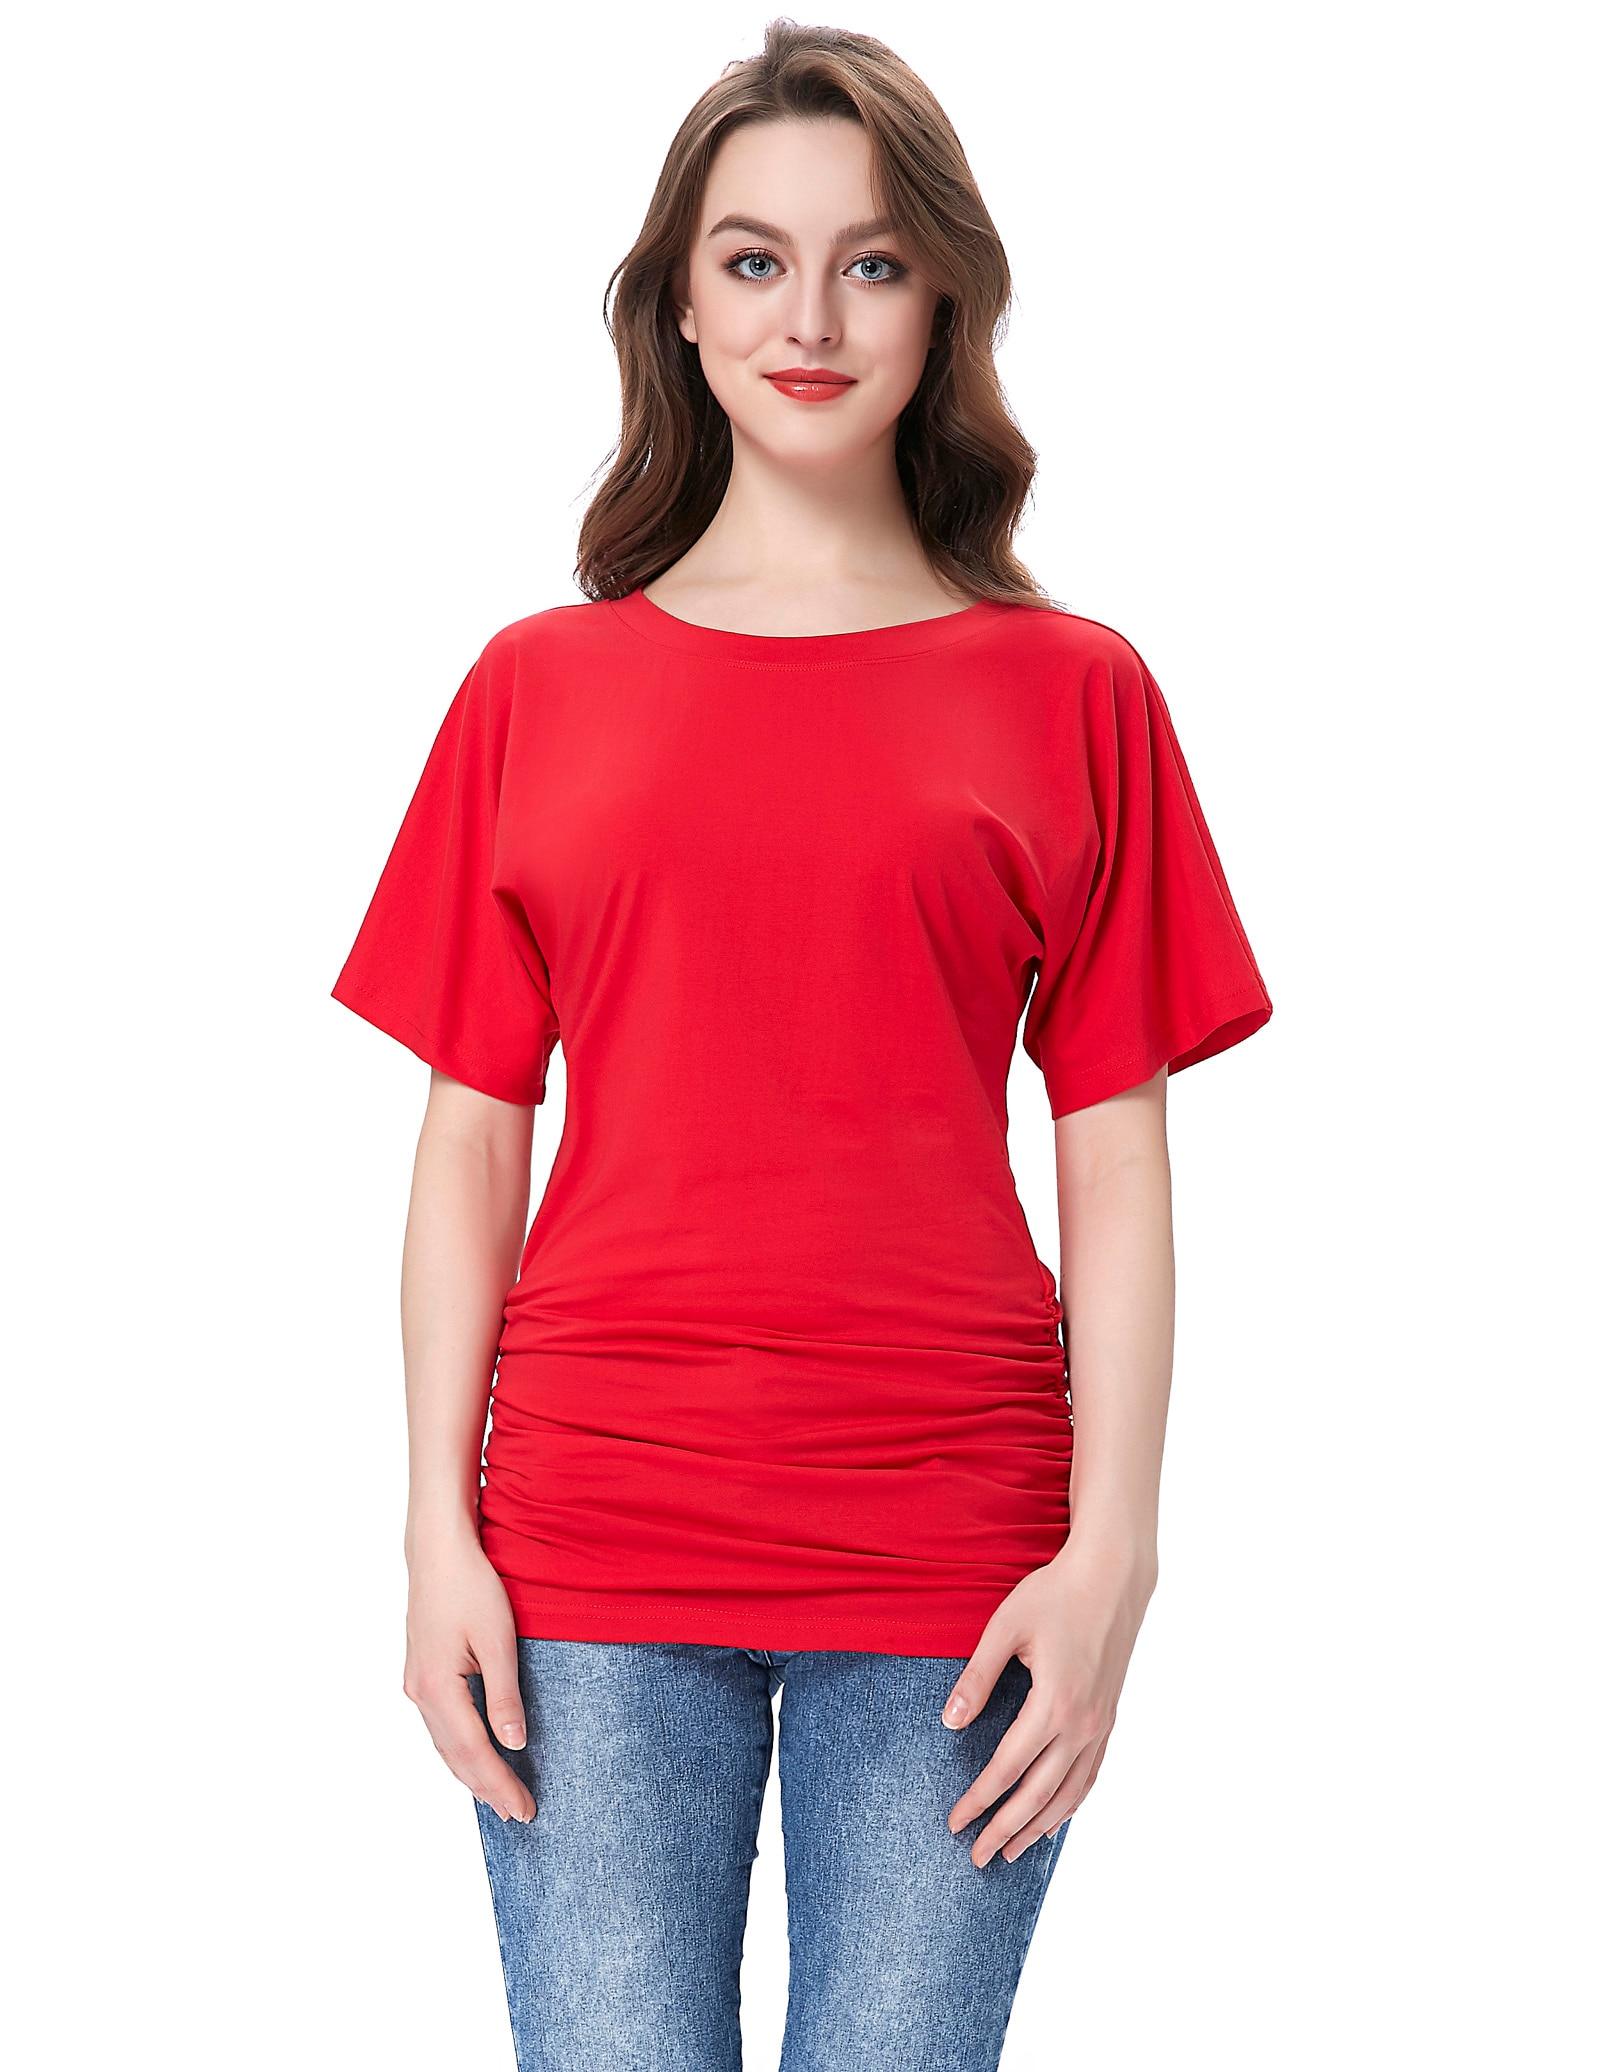 Women retro red tshirt coachella Short Sleeve Kimono Dolman Sleeve Round Neck Shirring T-Shirt Top vs pink women